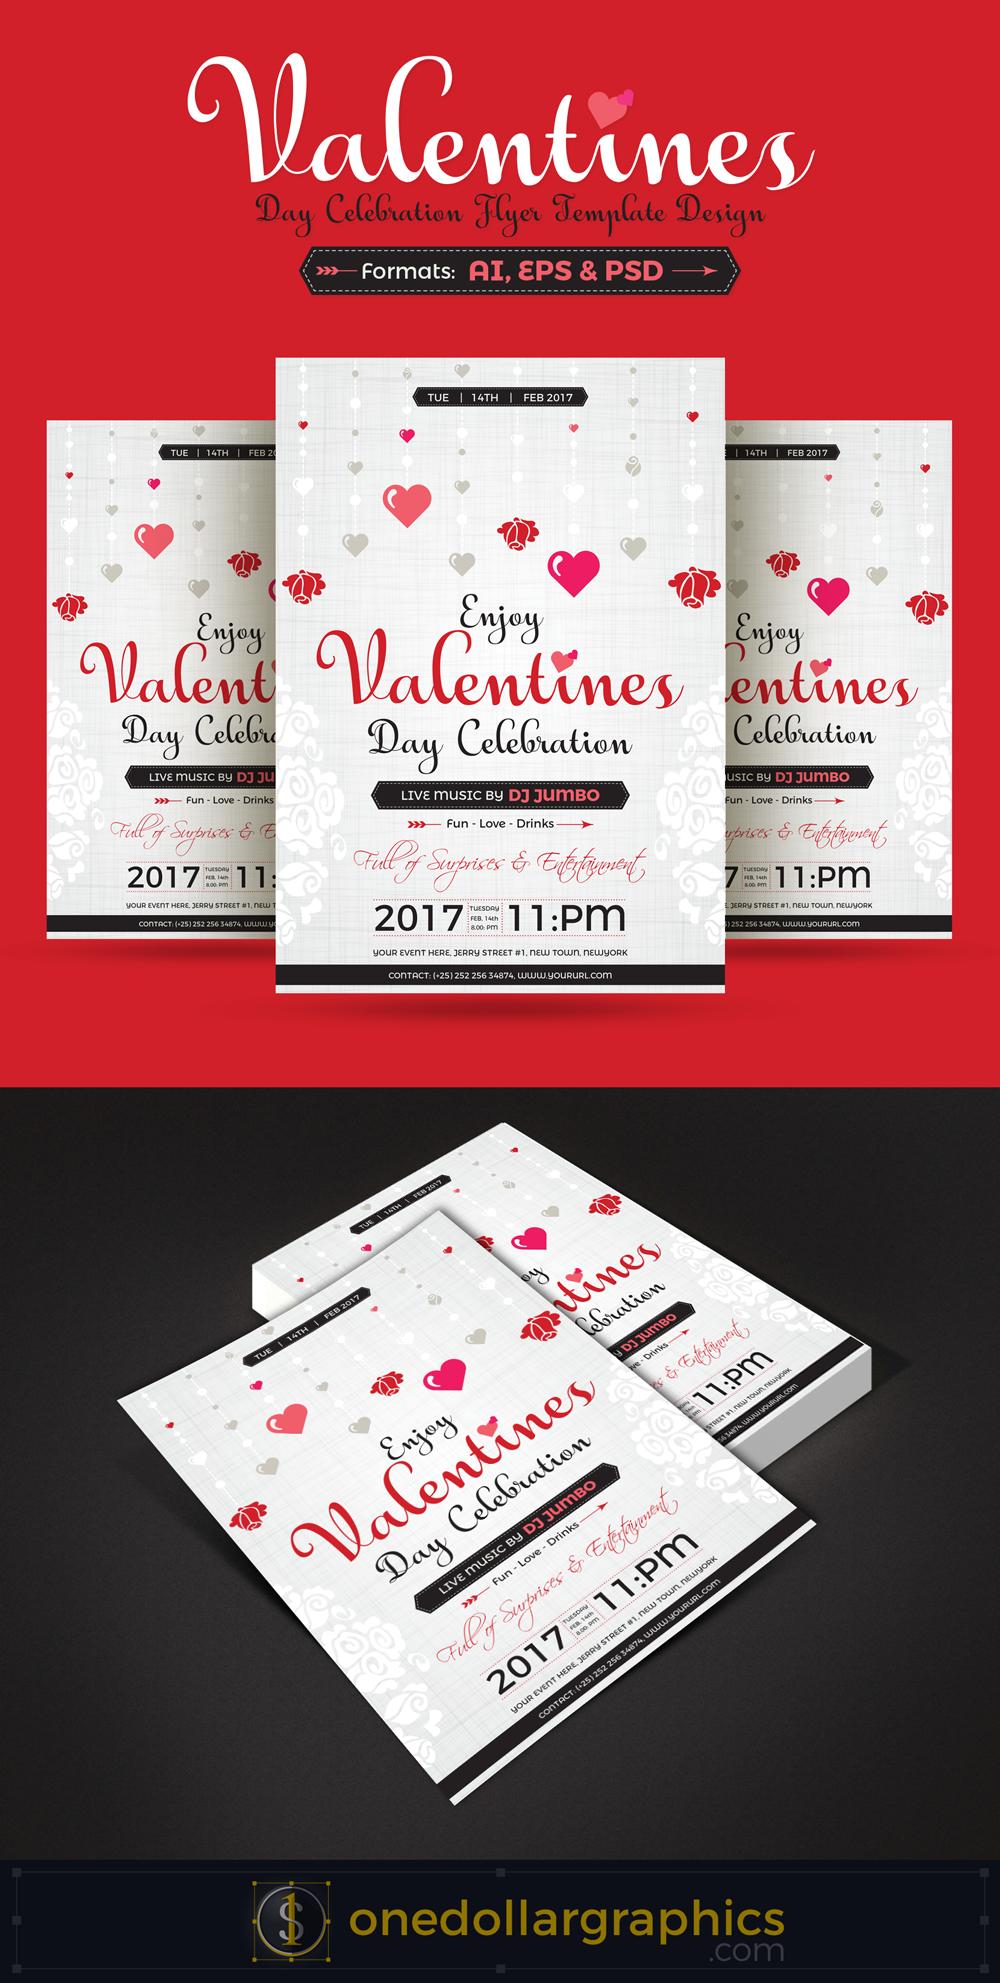 Valentines-Day-Celebration-Flyer-Template-Design